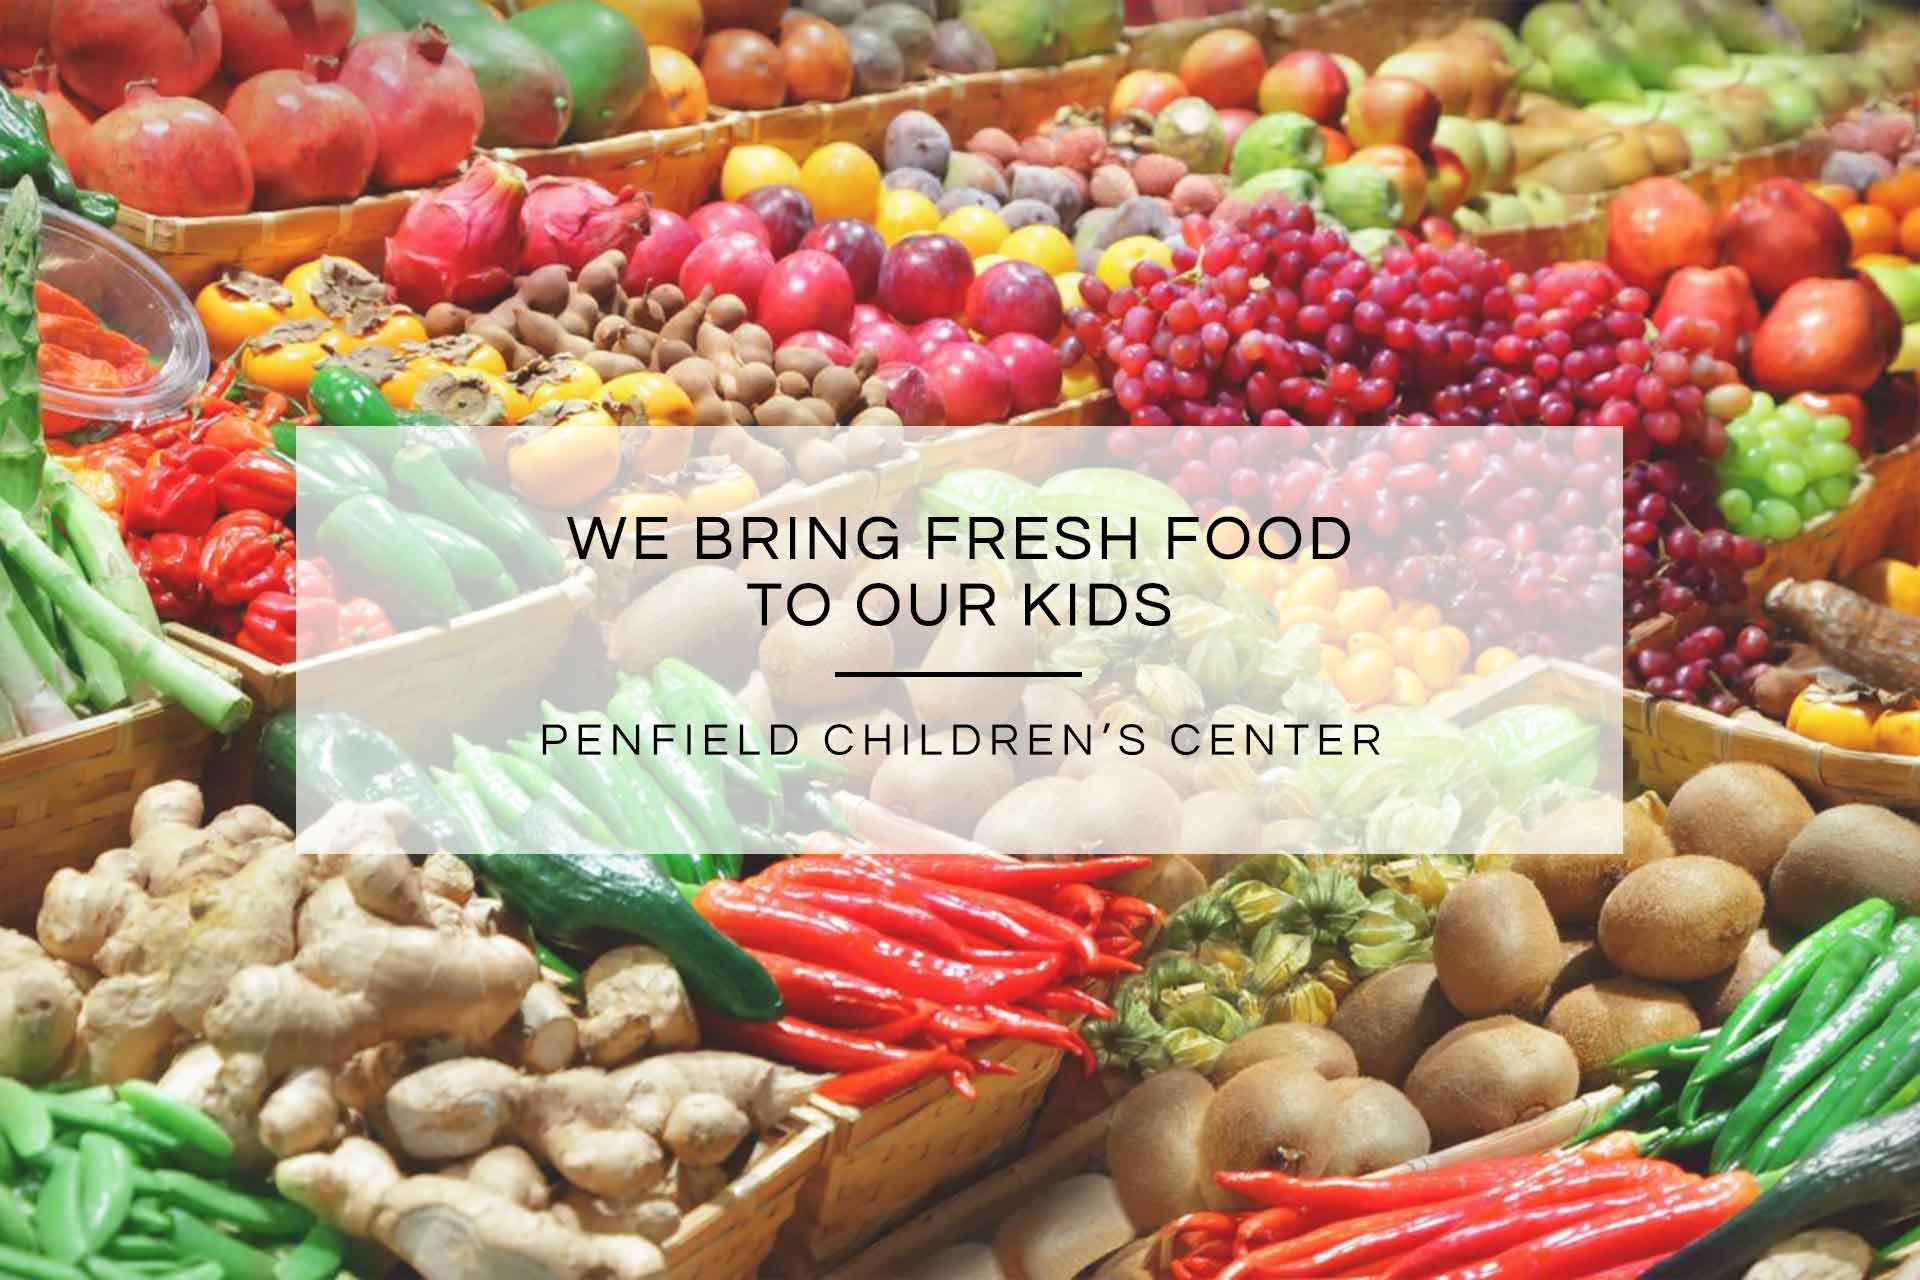 We-bring-fresh-food